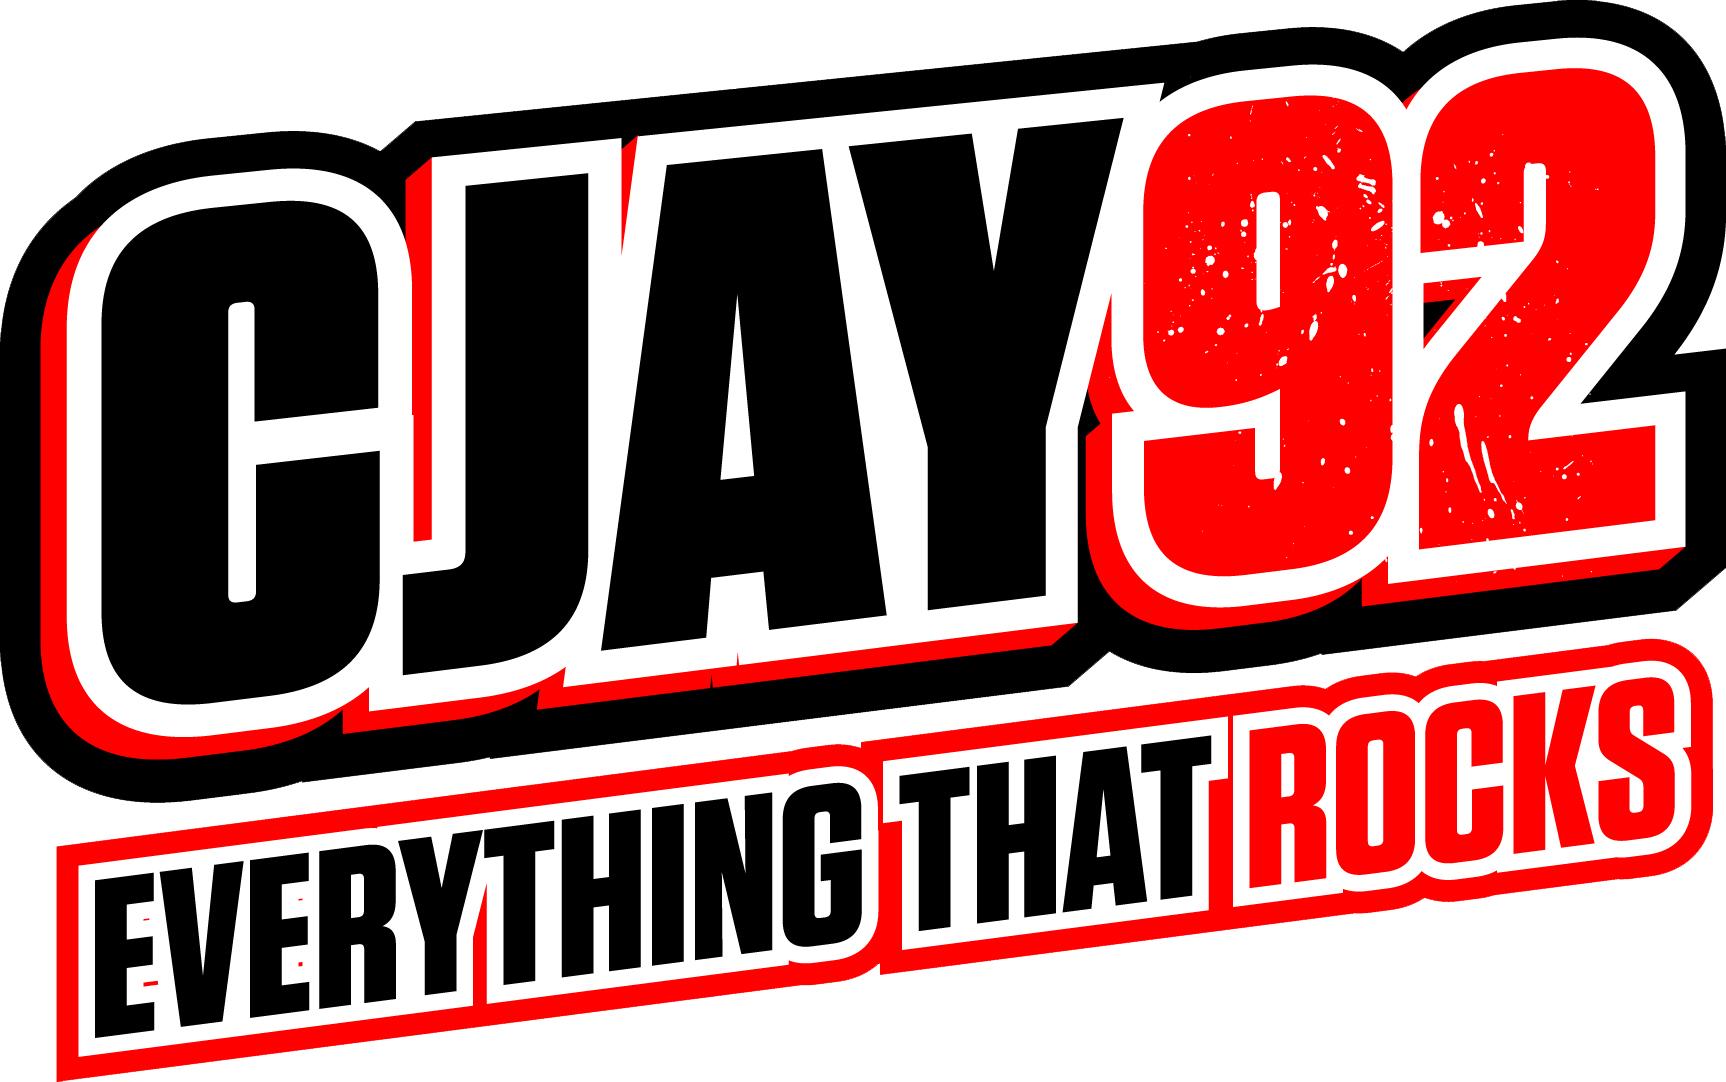 cjay92_everything_rocks_RGB.png